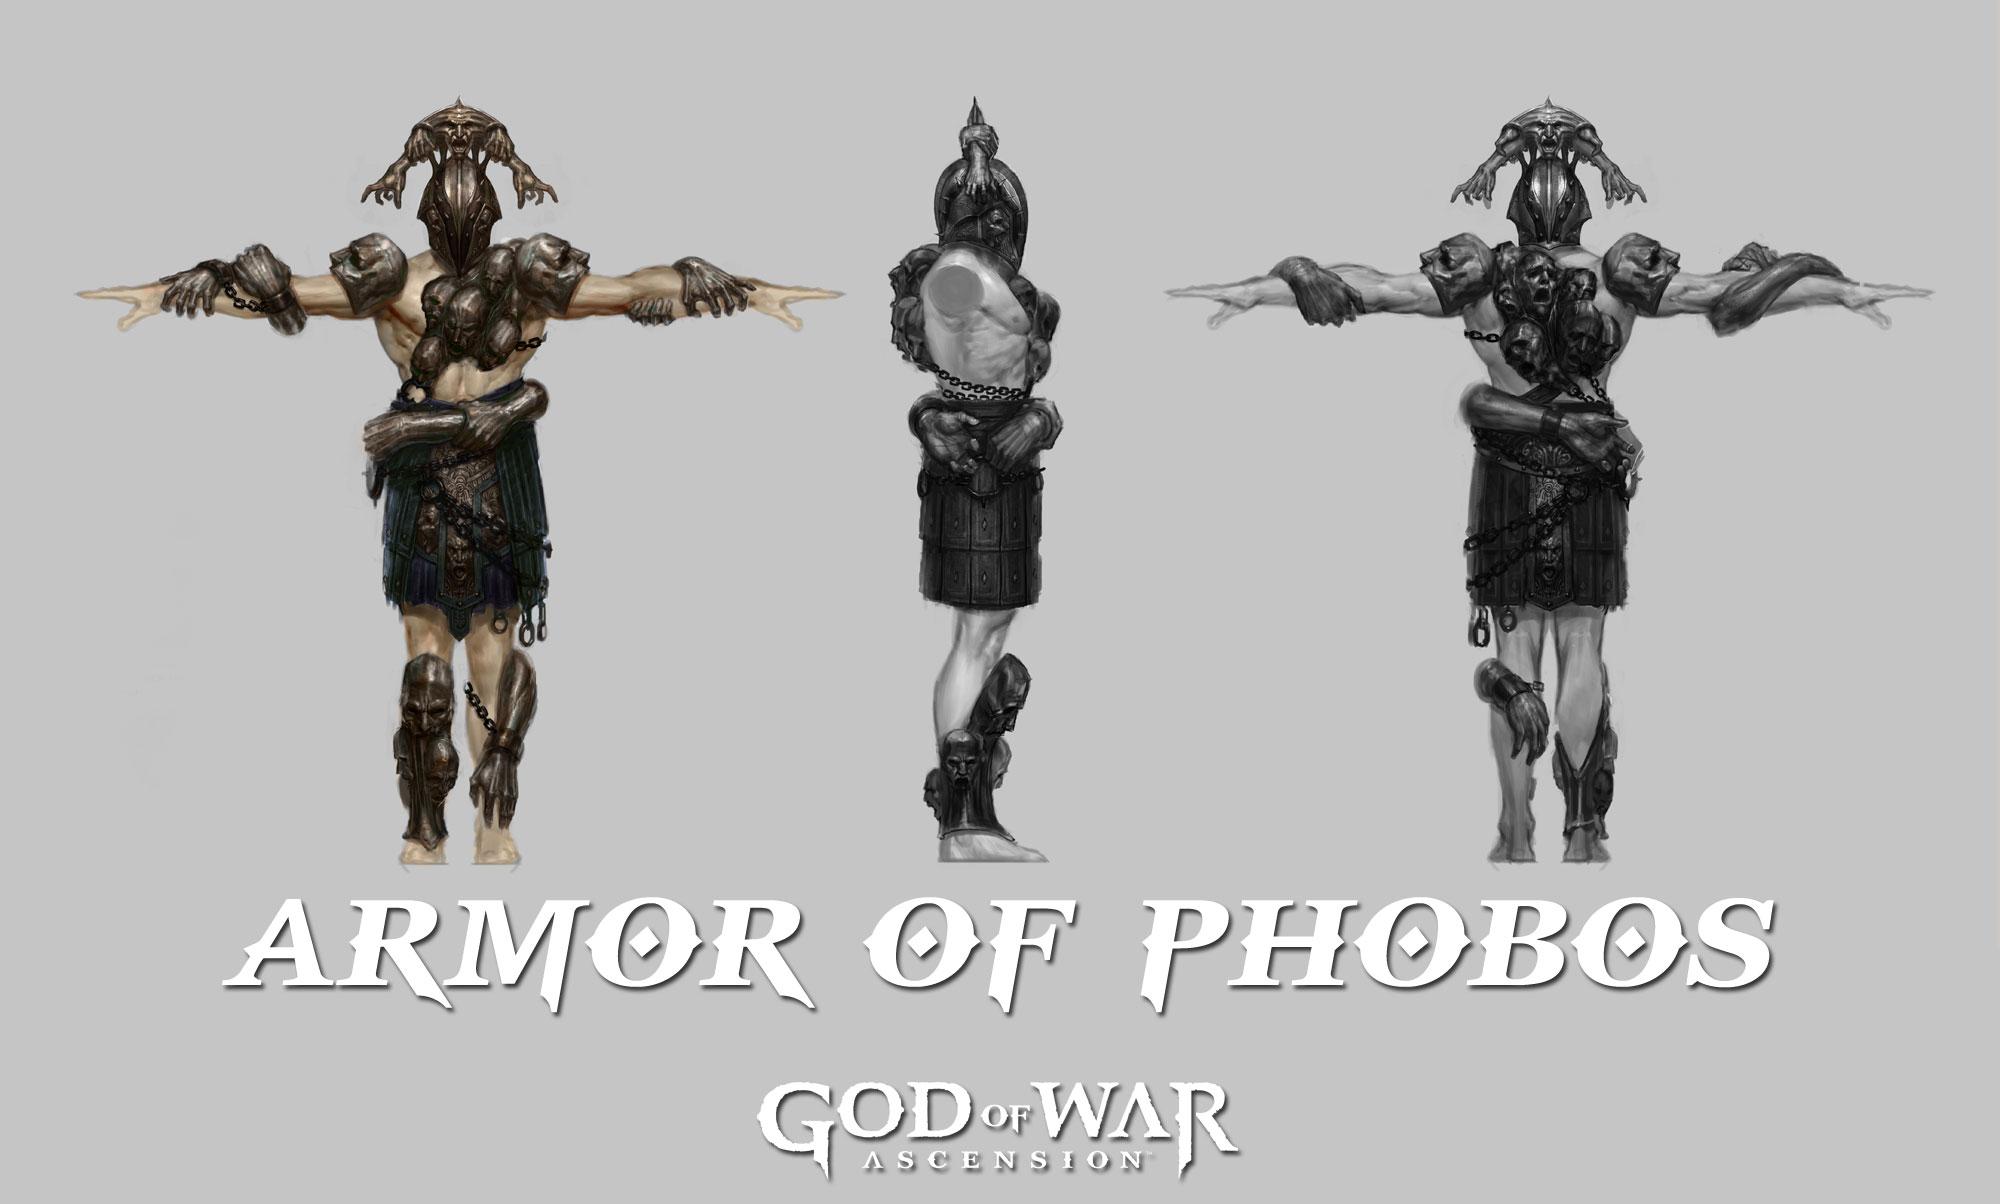 Image gow armorphobos rewardg god of war wiki fandom thumbnail for version as of 0516 january 18 2013 biocorpaavc Images